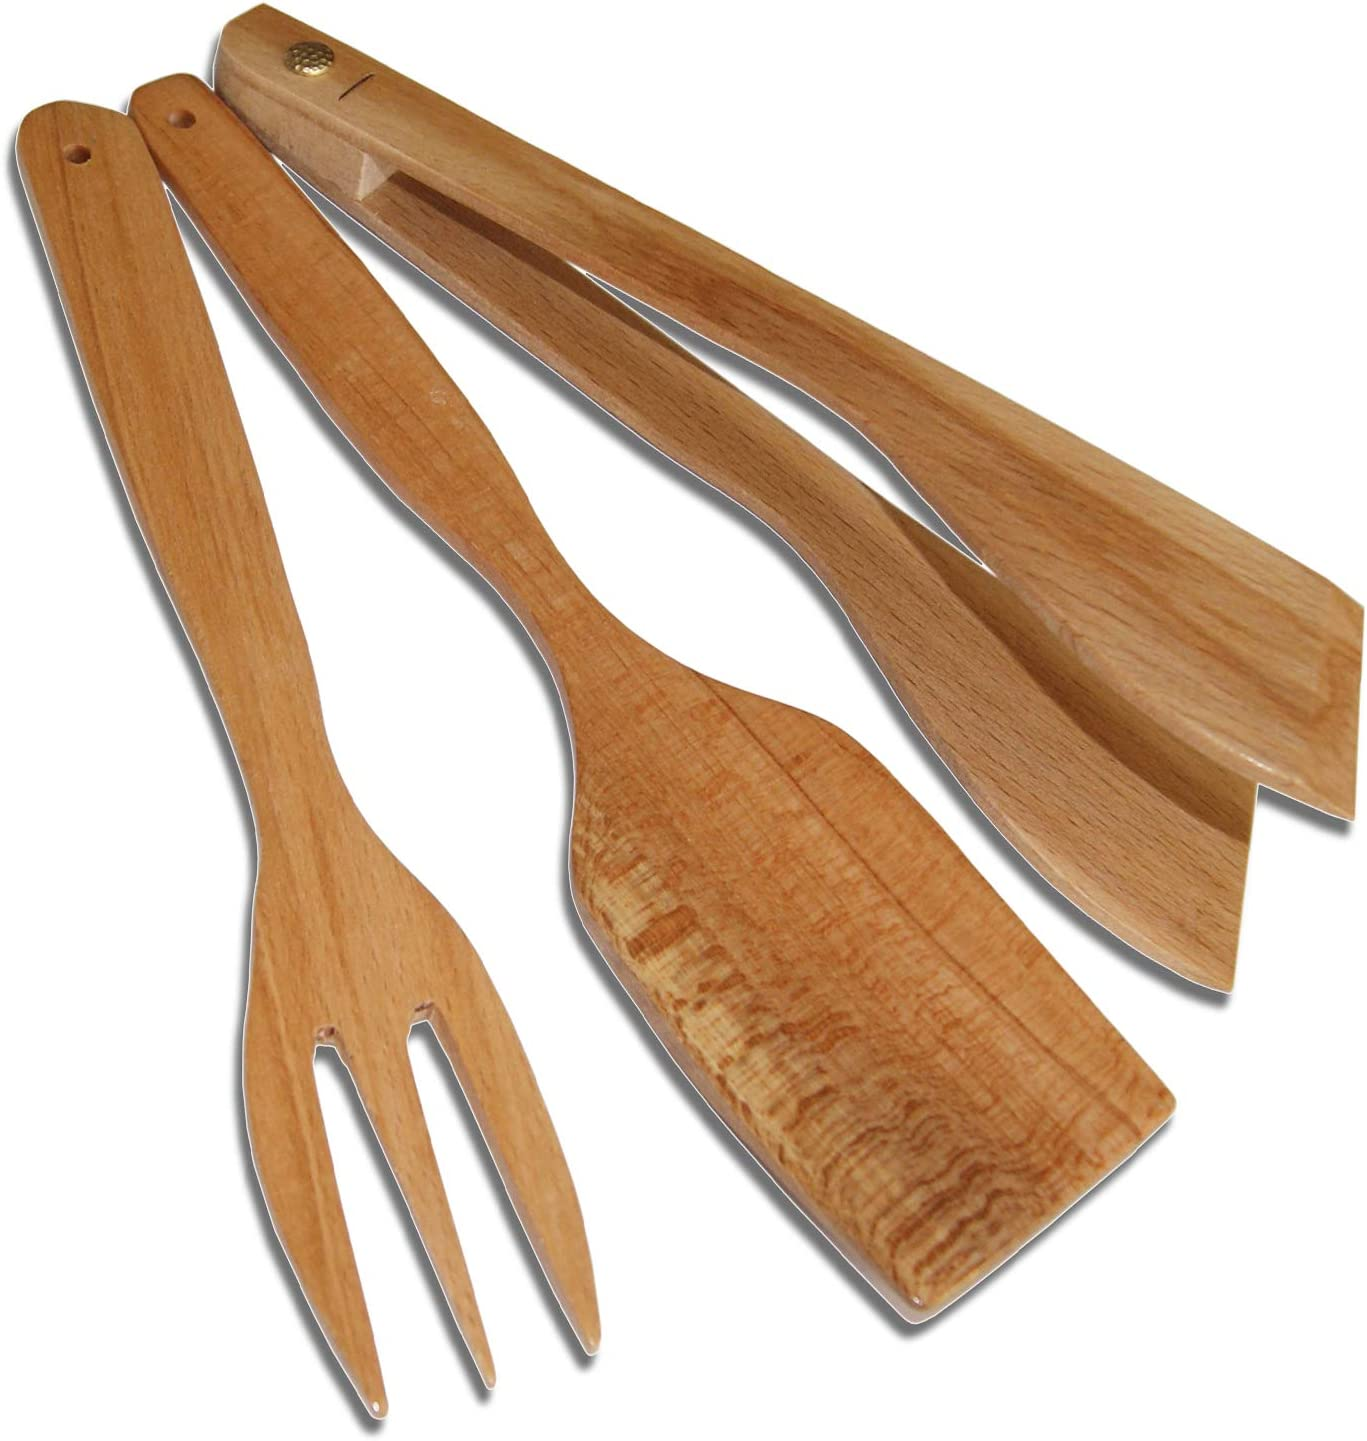 Ash tree kitchen spatula handmade spatula